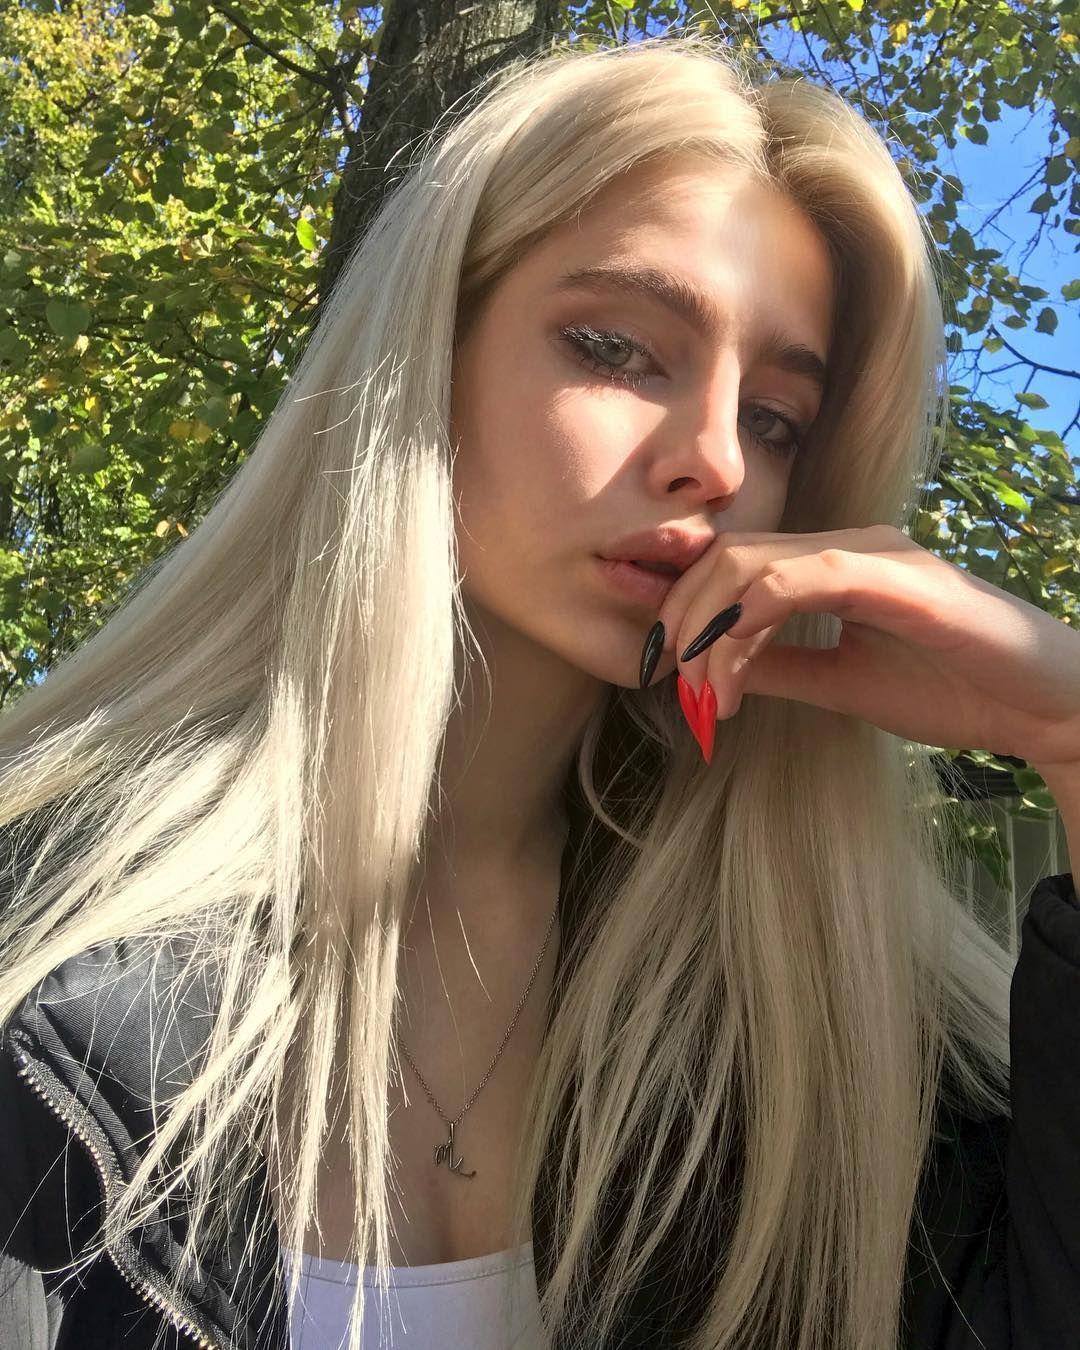 Pin By Gianna Sube On Vsco Pretty Blonde Girls Hair Life Blonde Girl